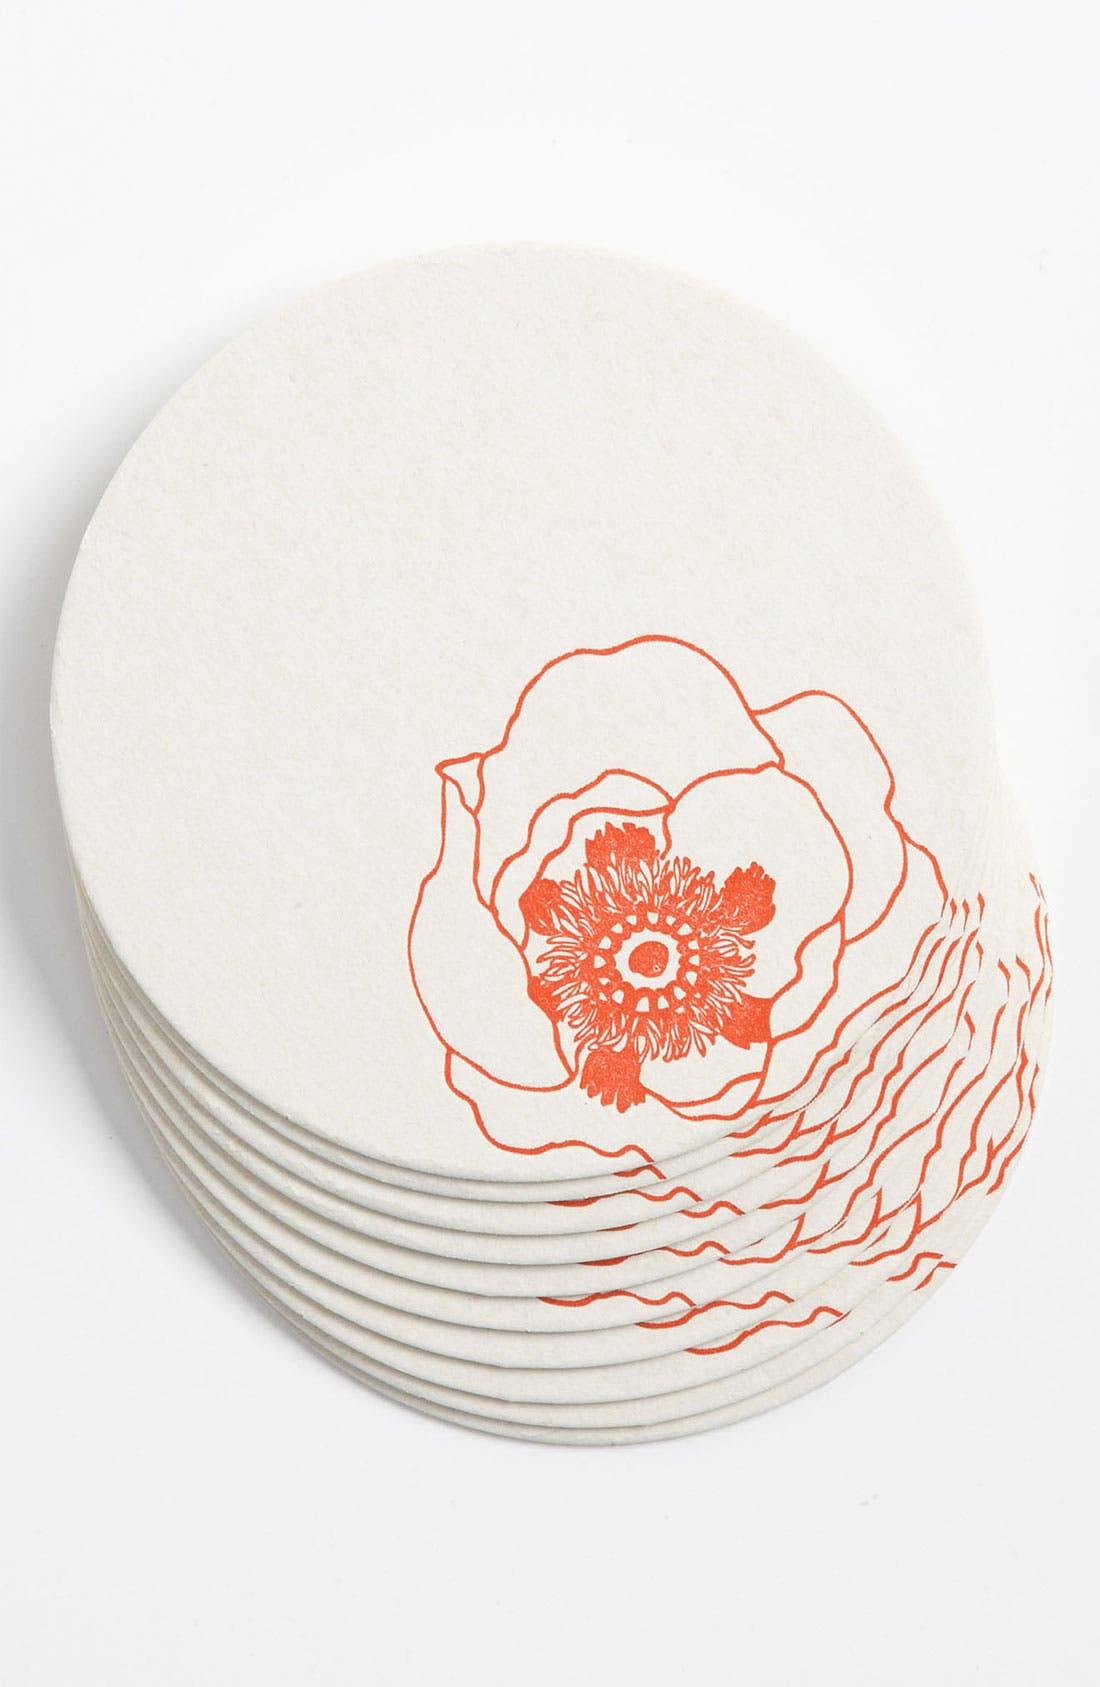 Main Image - 'Poppy Flowers' Letterpress Coasters (Set of 10)